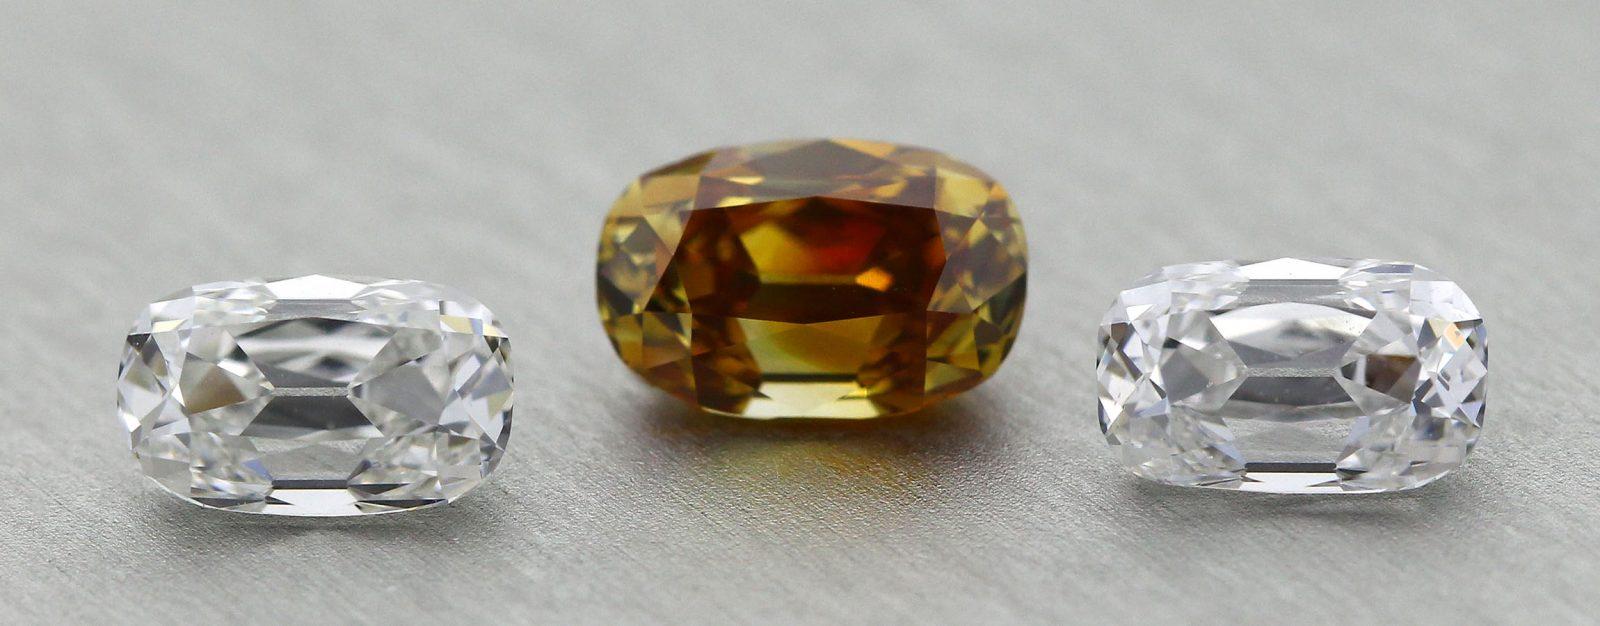 Three stone Old Mine Cut ensemble - a rare diamond set